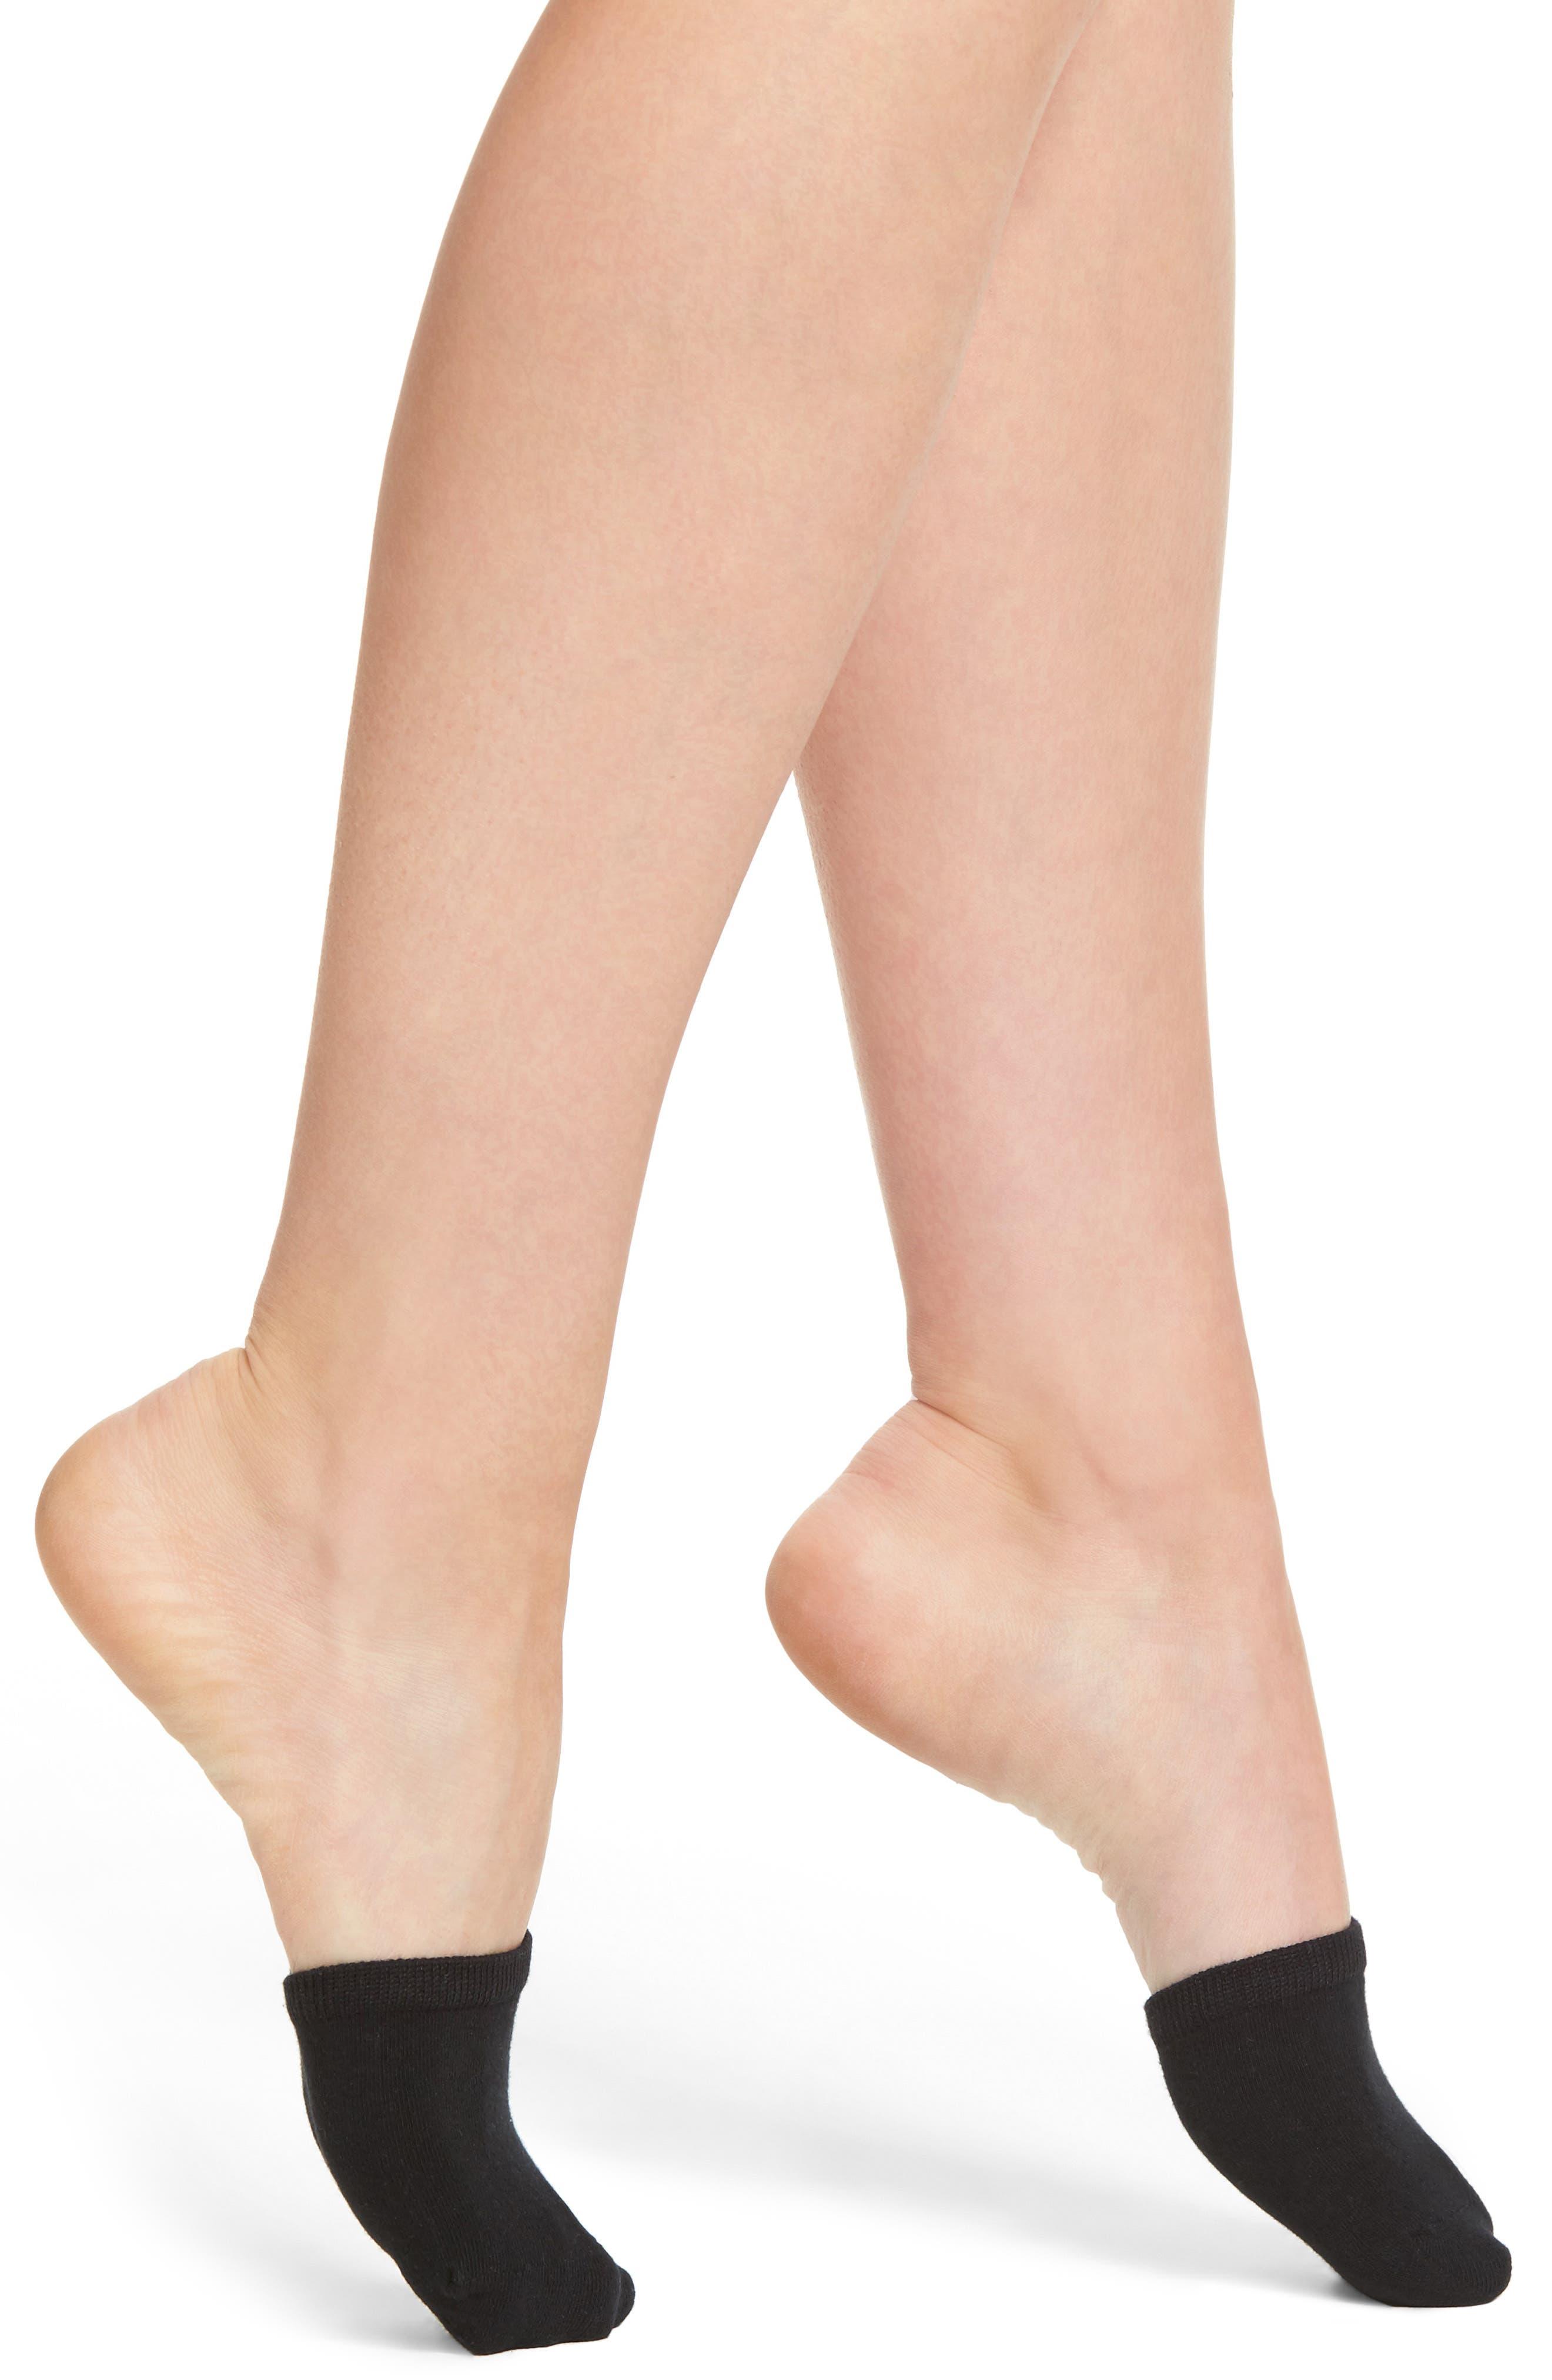 2-Pack Mule Socks,                         Main,                         color, Black